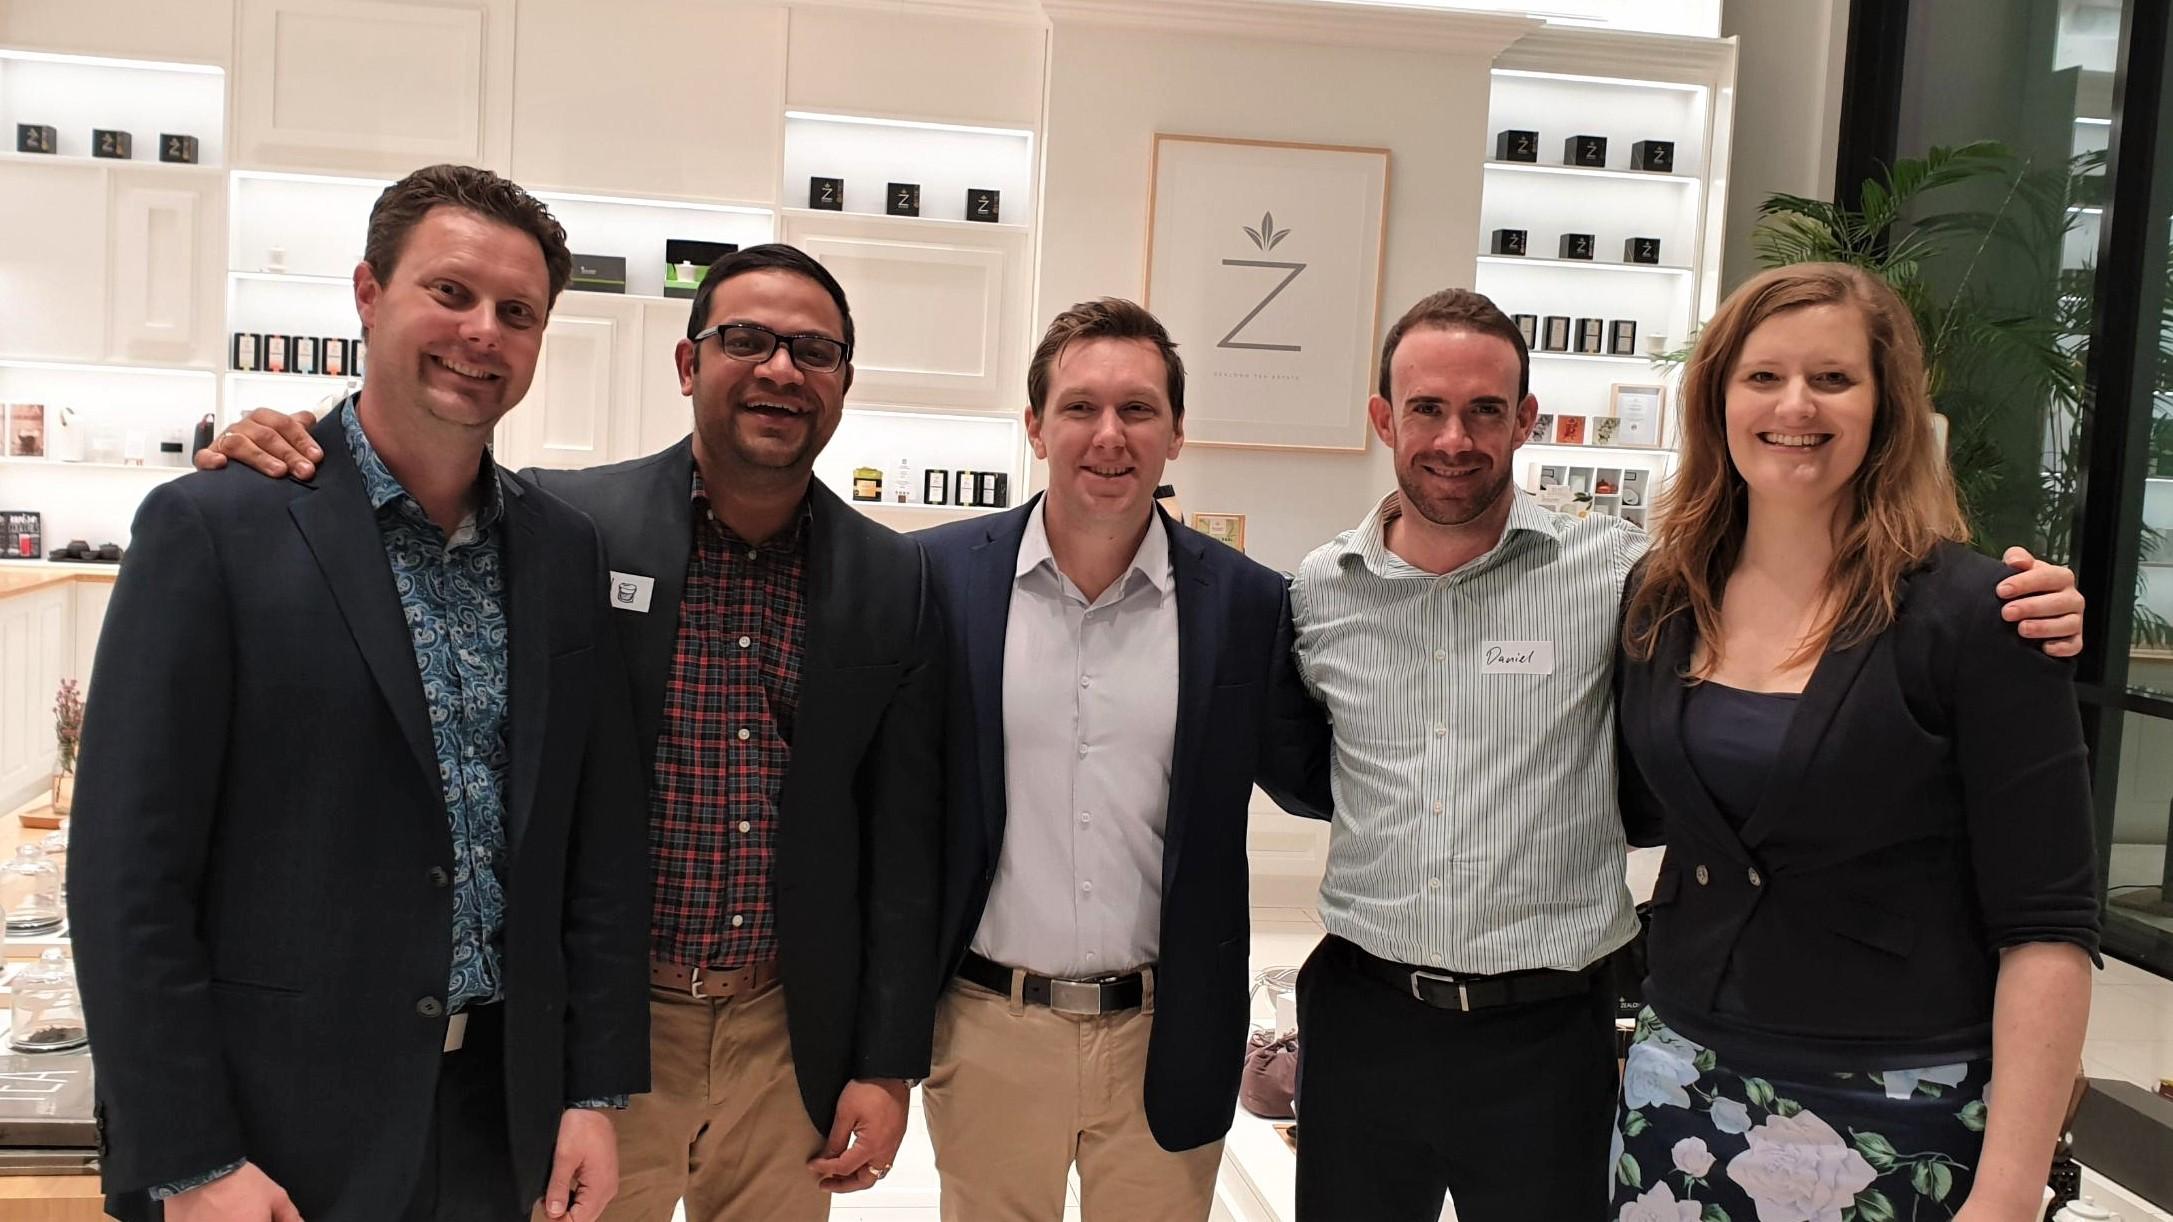 Linkedin local Hamilton event at Zealong Tea